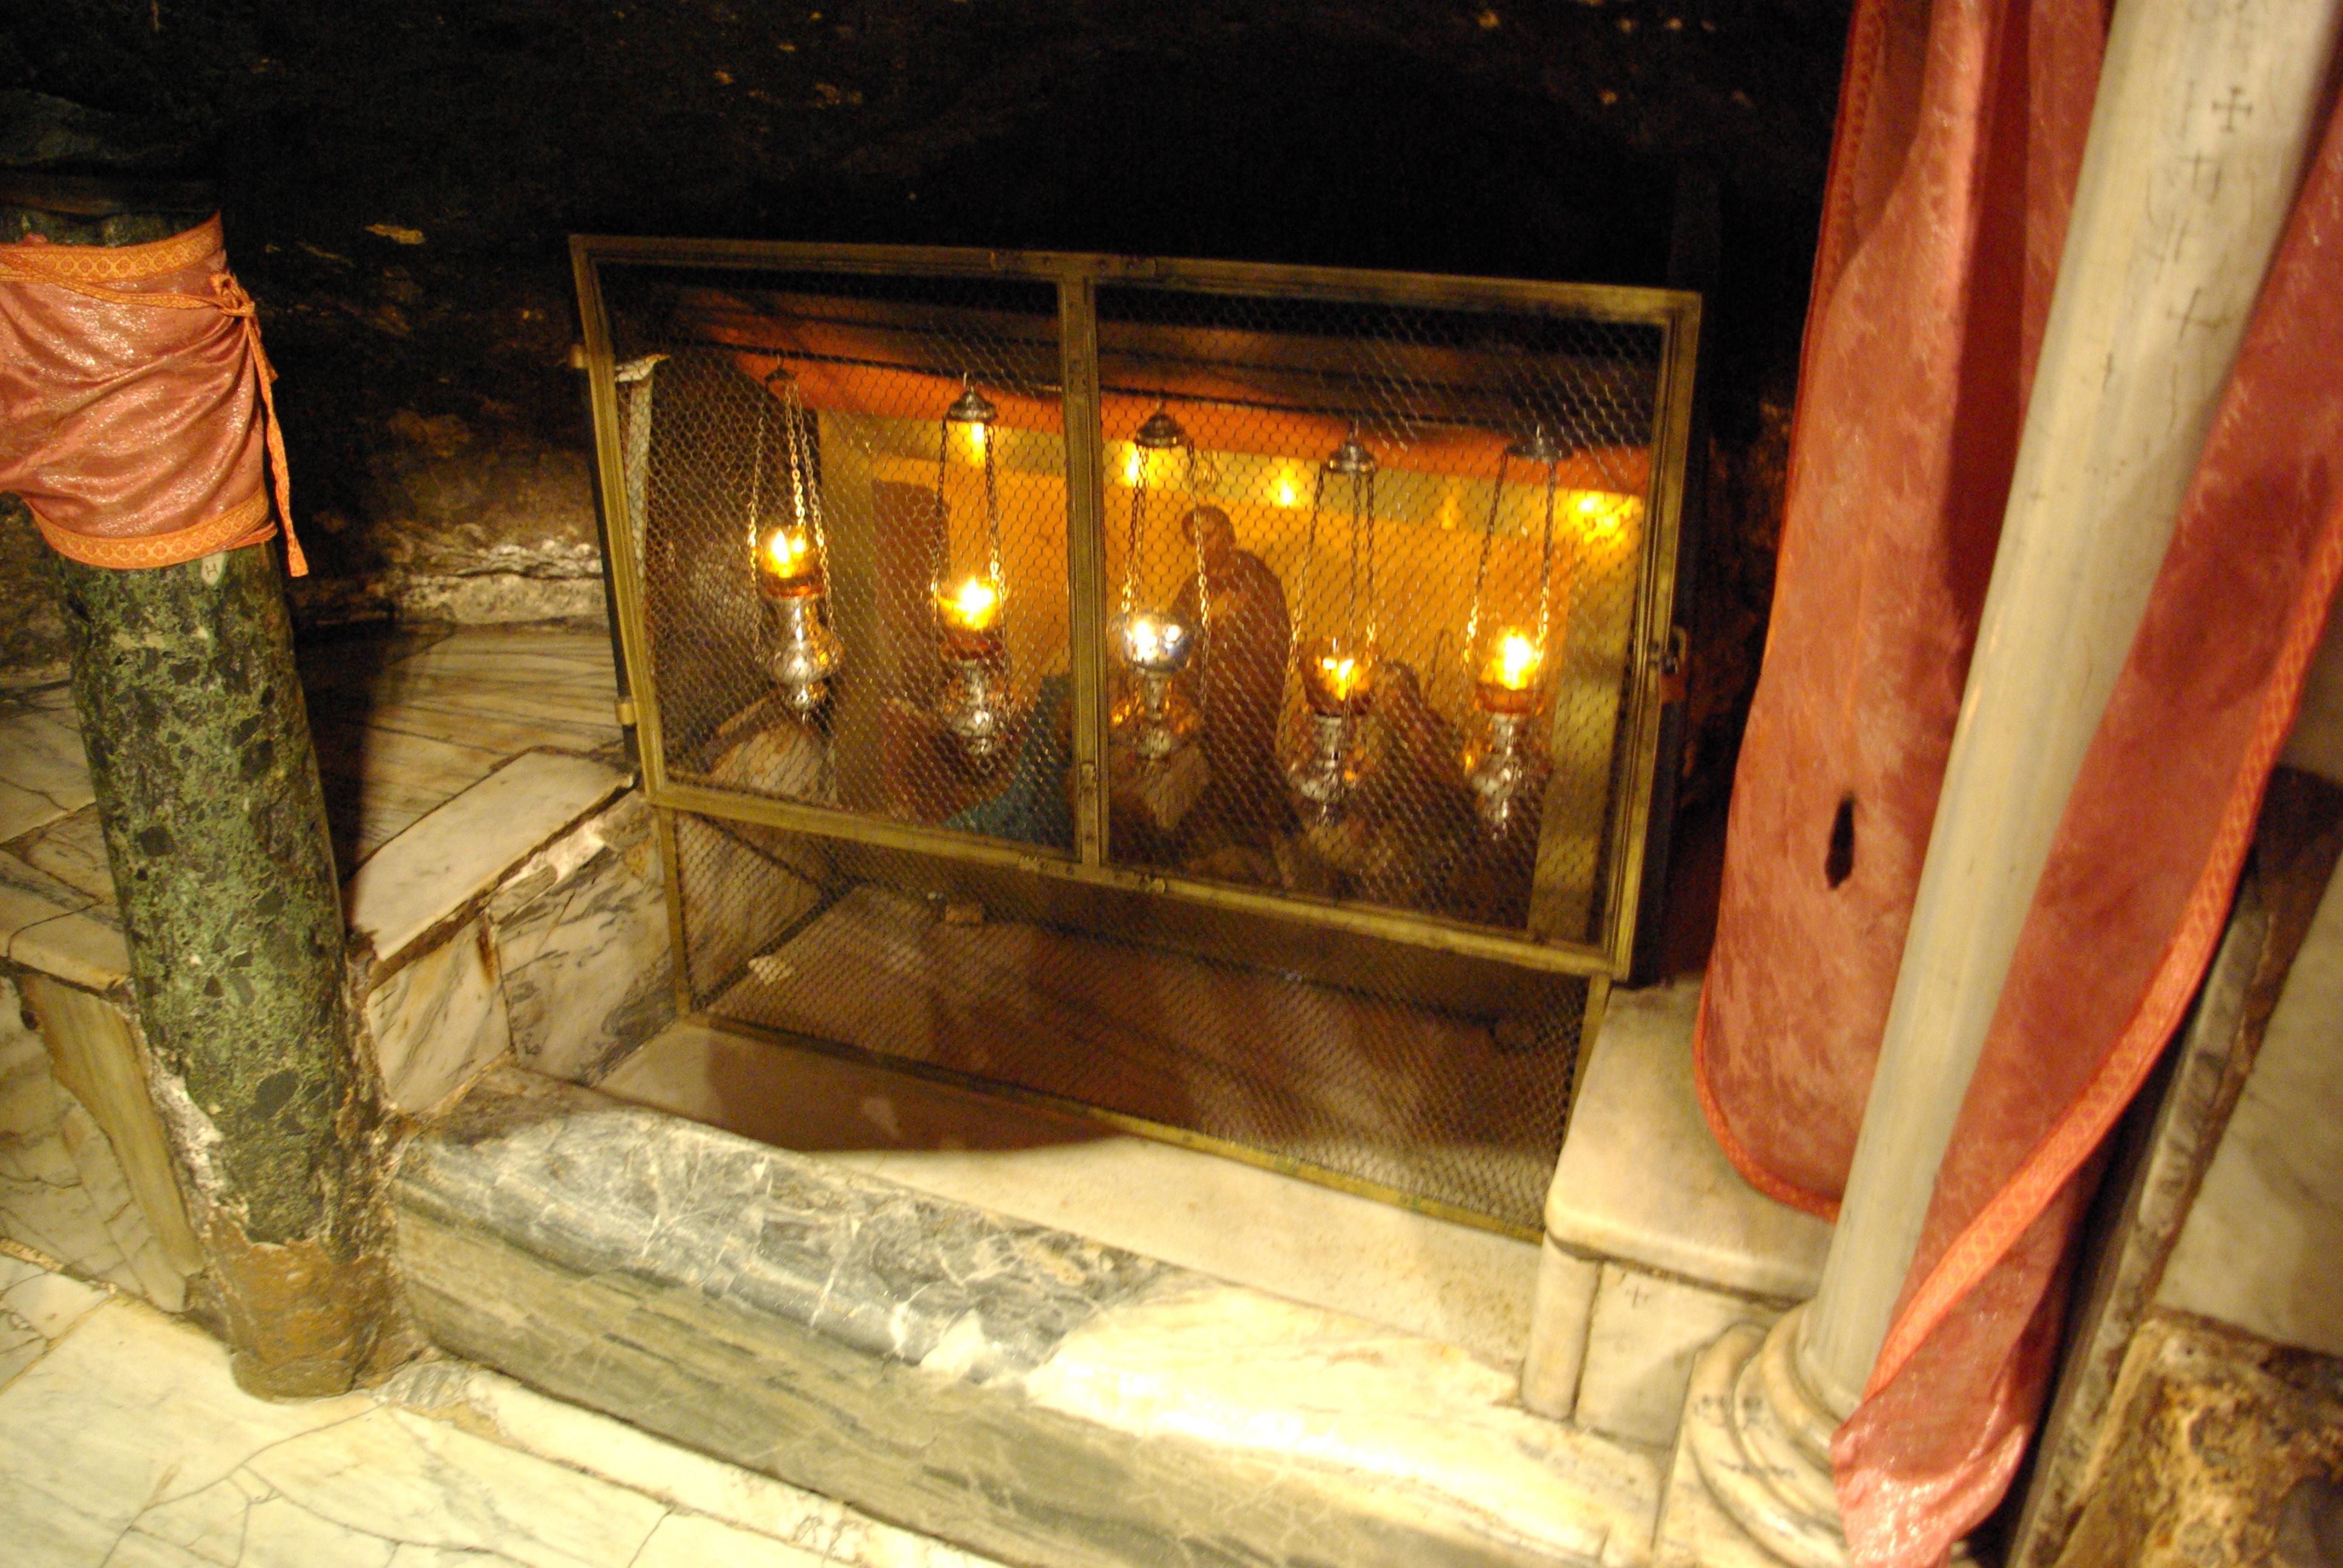 Картинки по запросу Вифлеем - храм Рождества Христова ясли